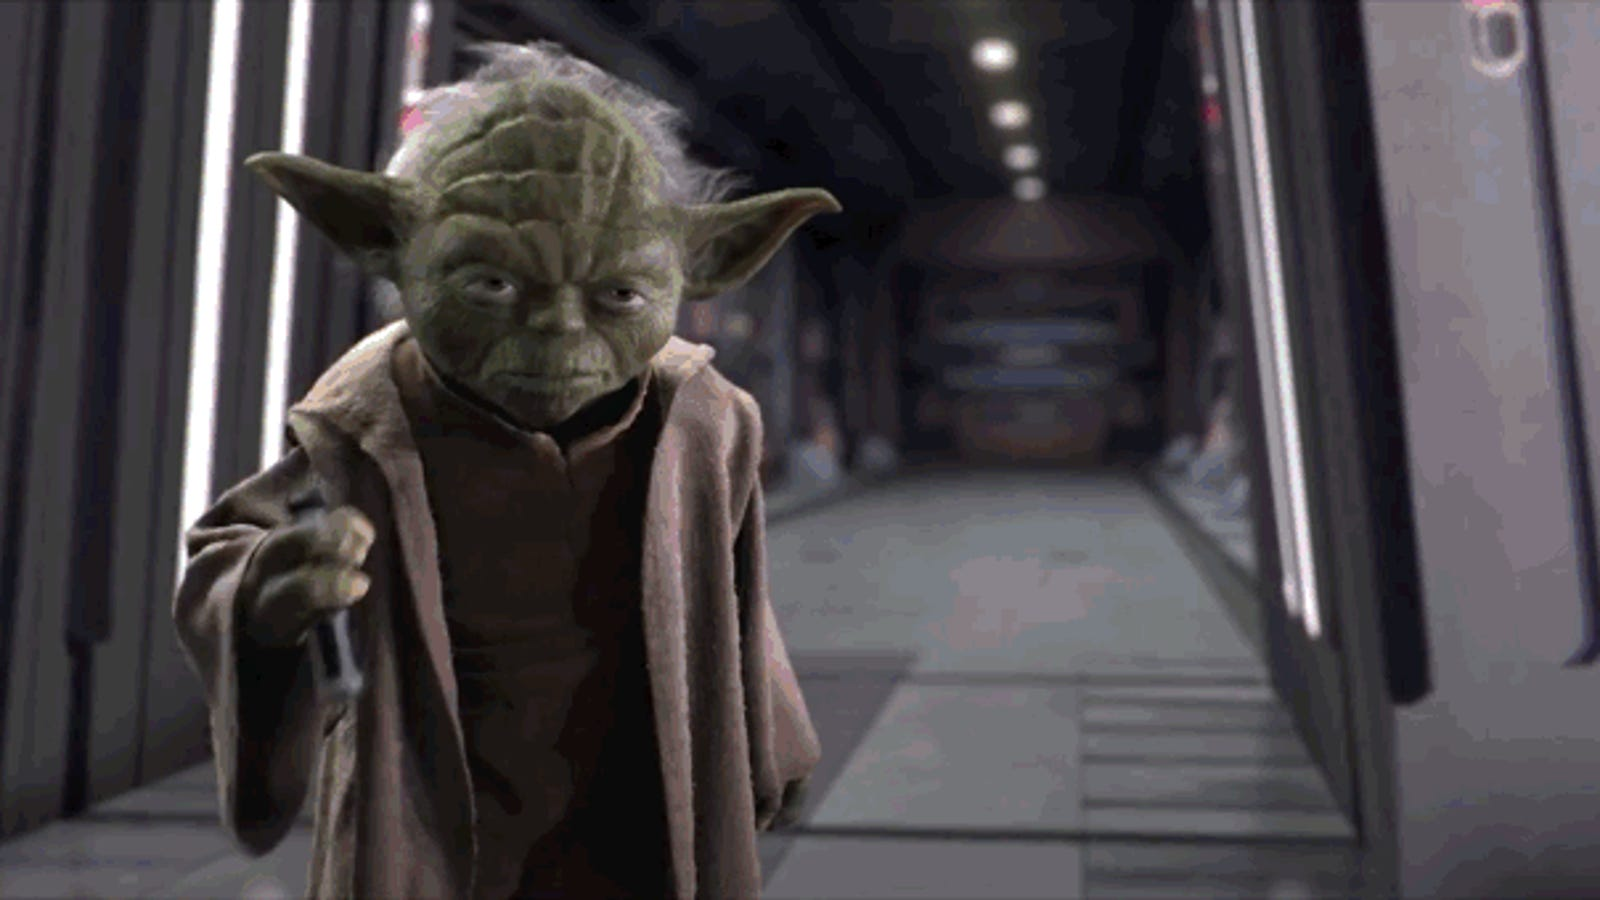 De Star Wars a Daft Punk: 10 mashups alucinantes